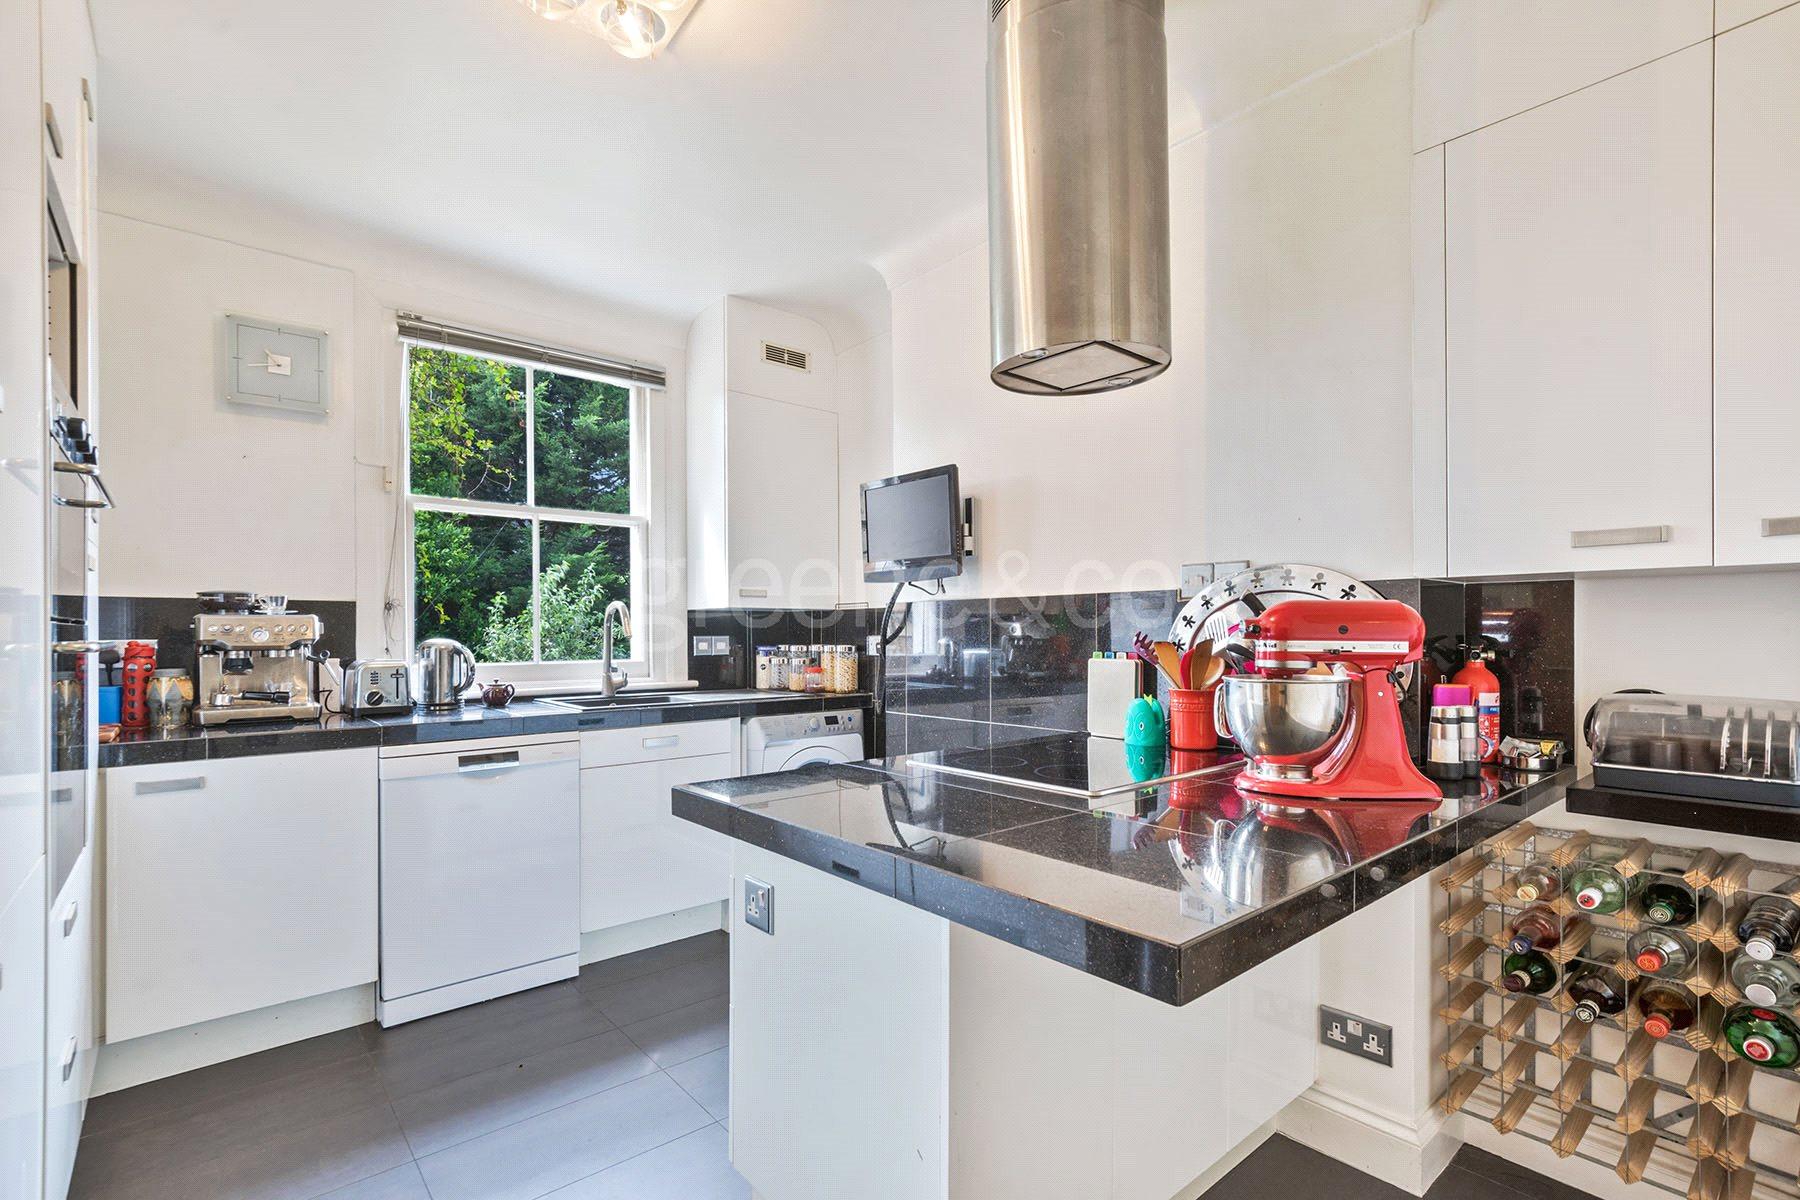 3 Bedrooms Flat for sale in Loveridge Road, West Hampstead, London, NW6